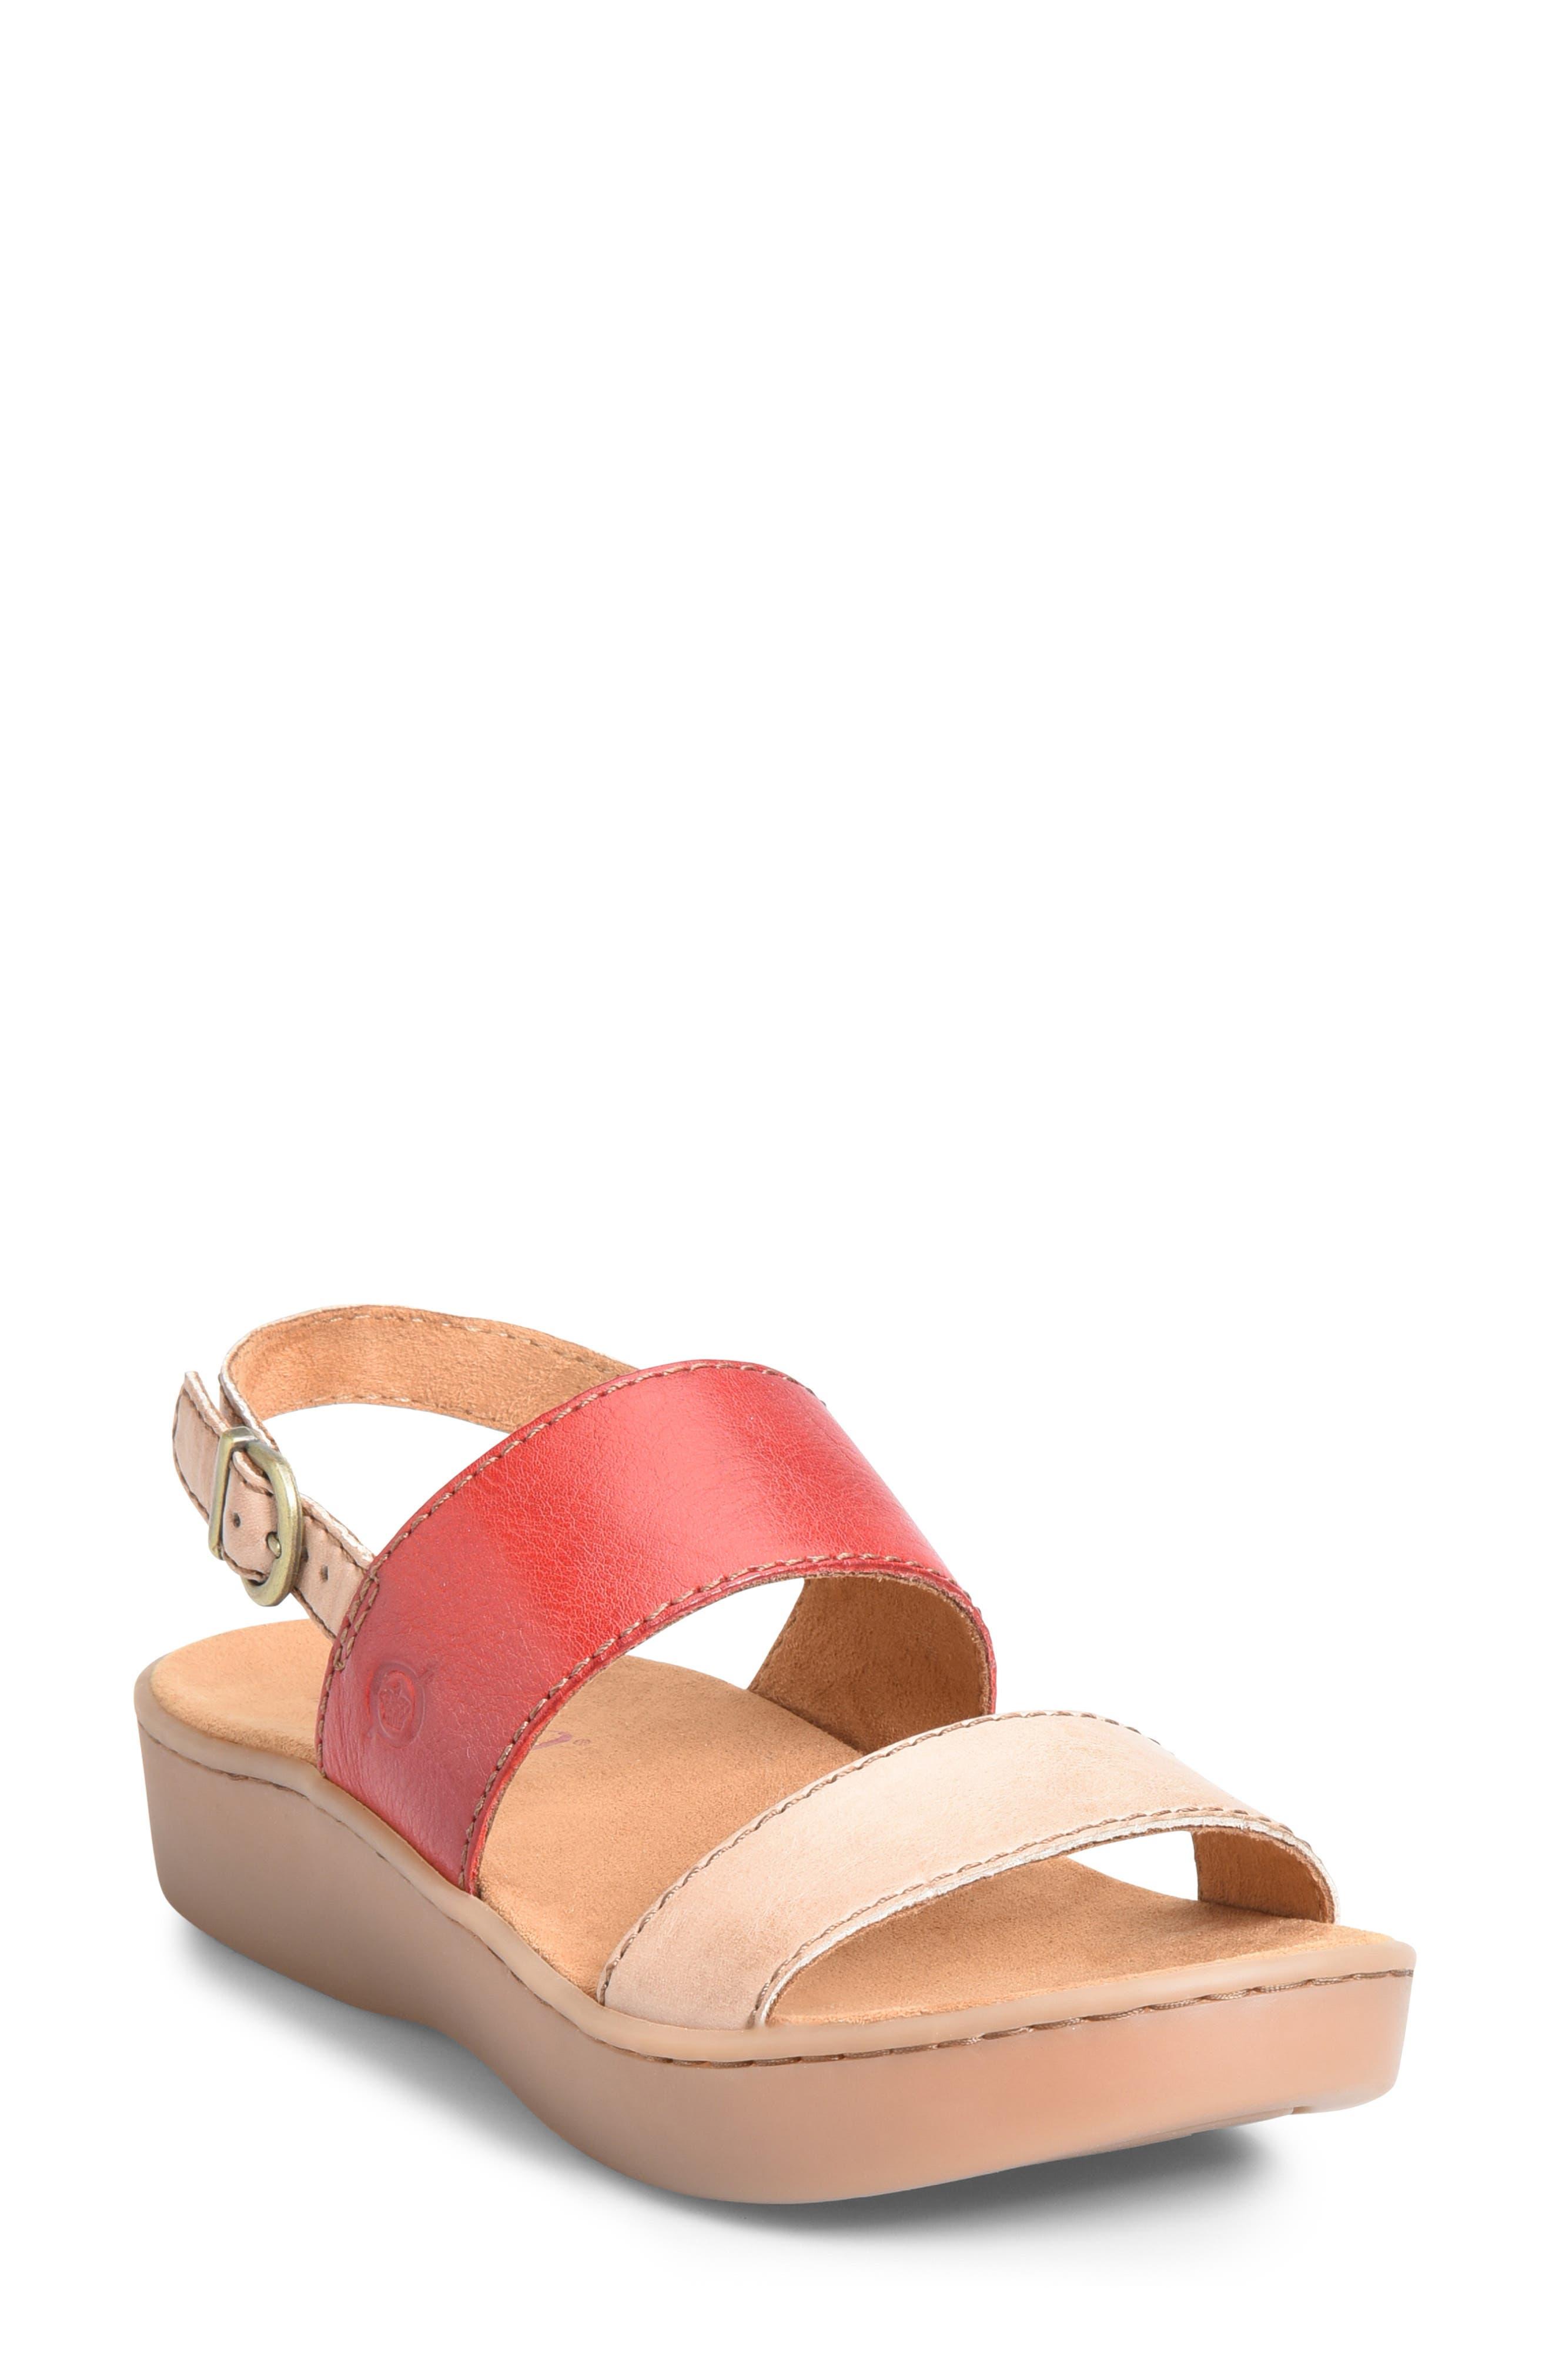 B?rn Oconee Platform Sandal, Red